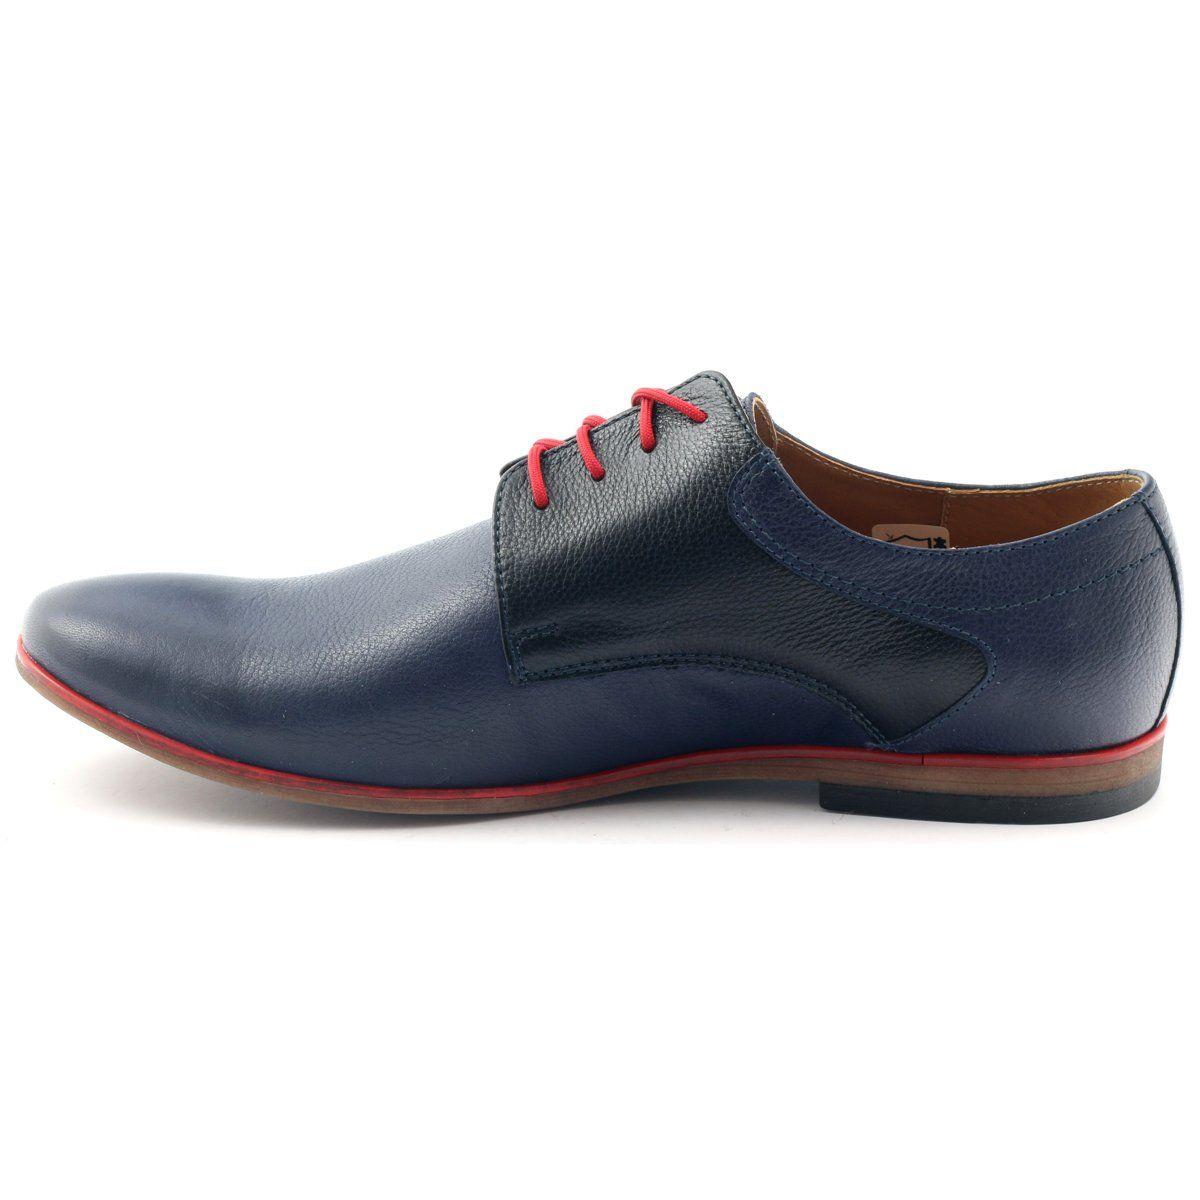 Polbuty Meskie Moskala H 5 Granatowe Czarne Czerwone Dress Shoes Men Dress Shoes Oxford Shoes